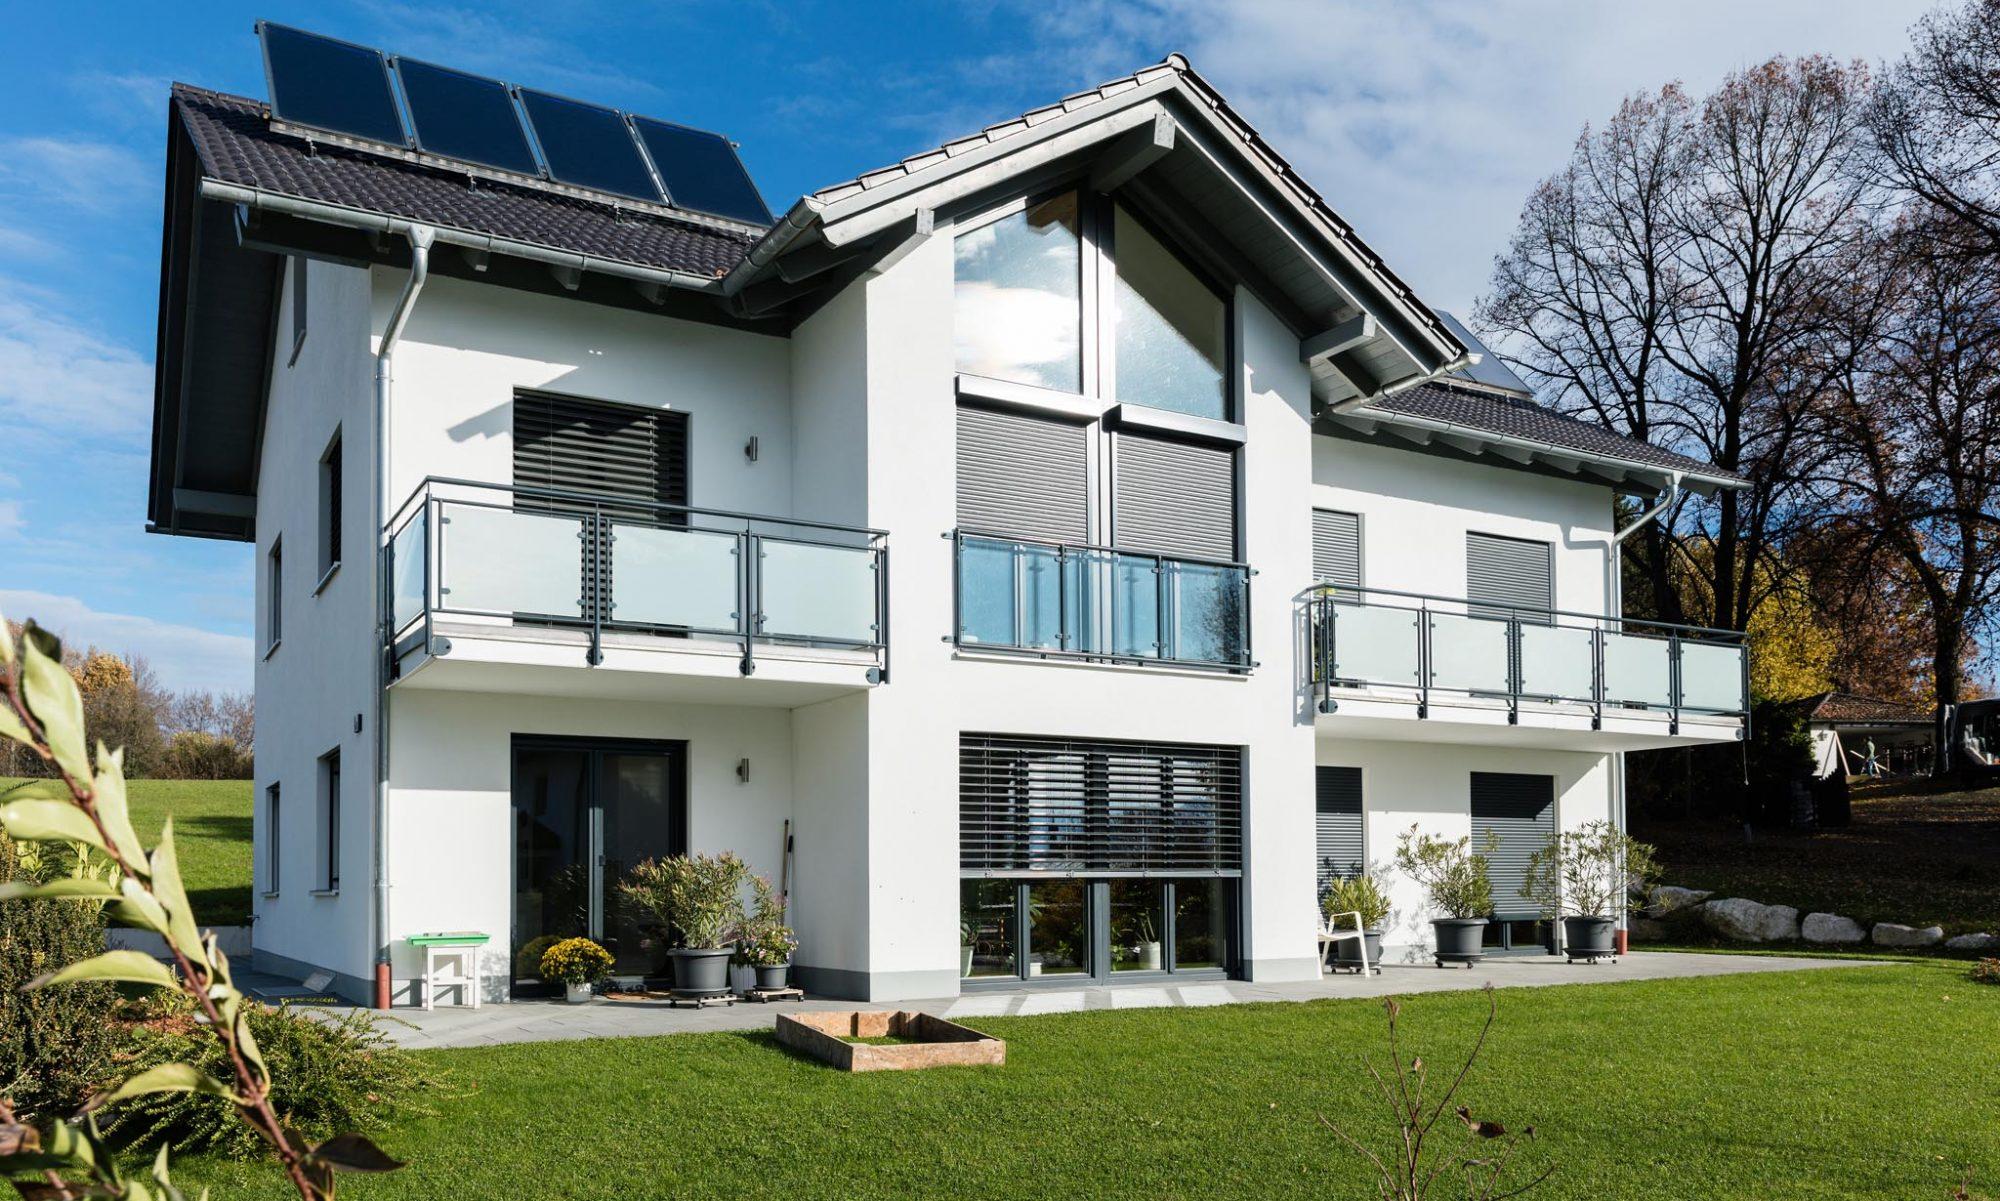 Sennes Wohnbau GmbH